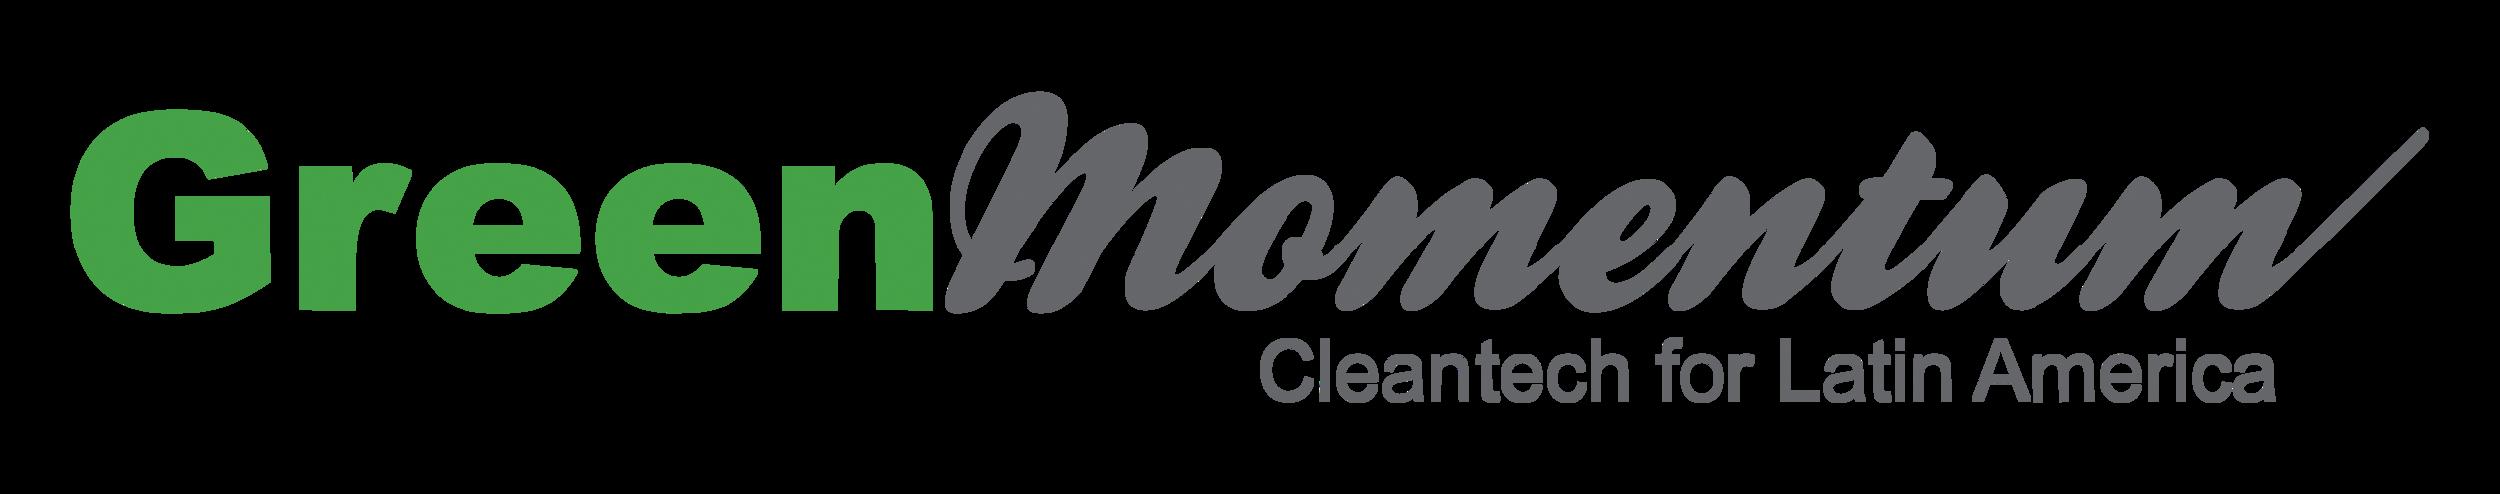 logo-GreenMomentum-1.png